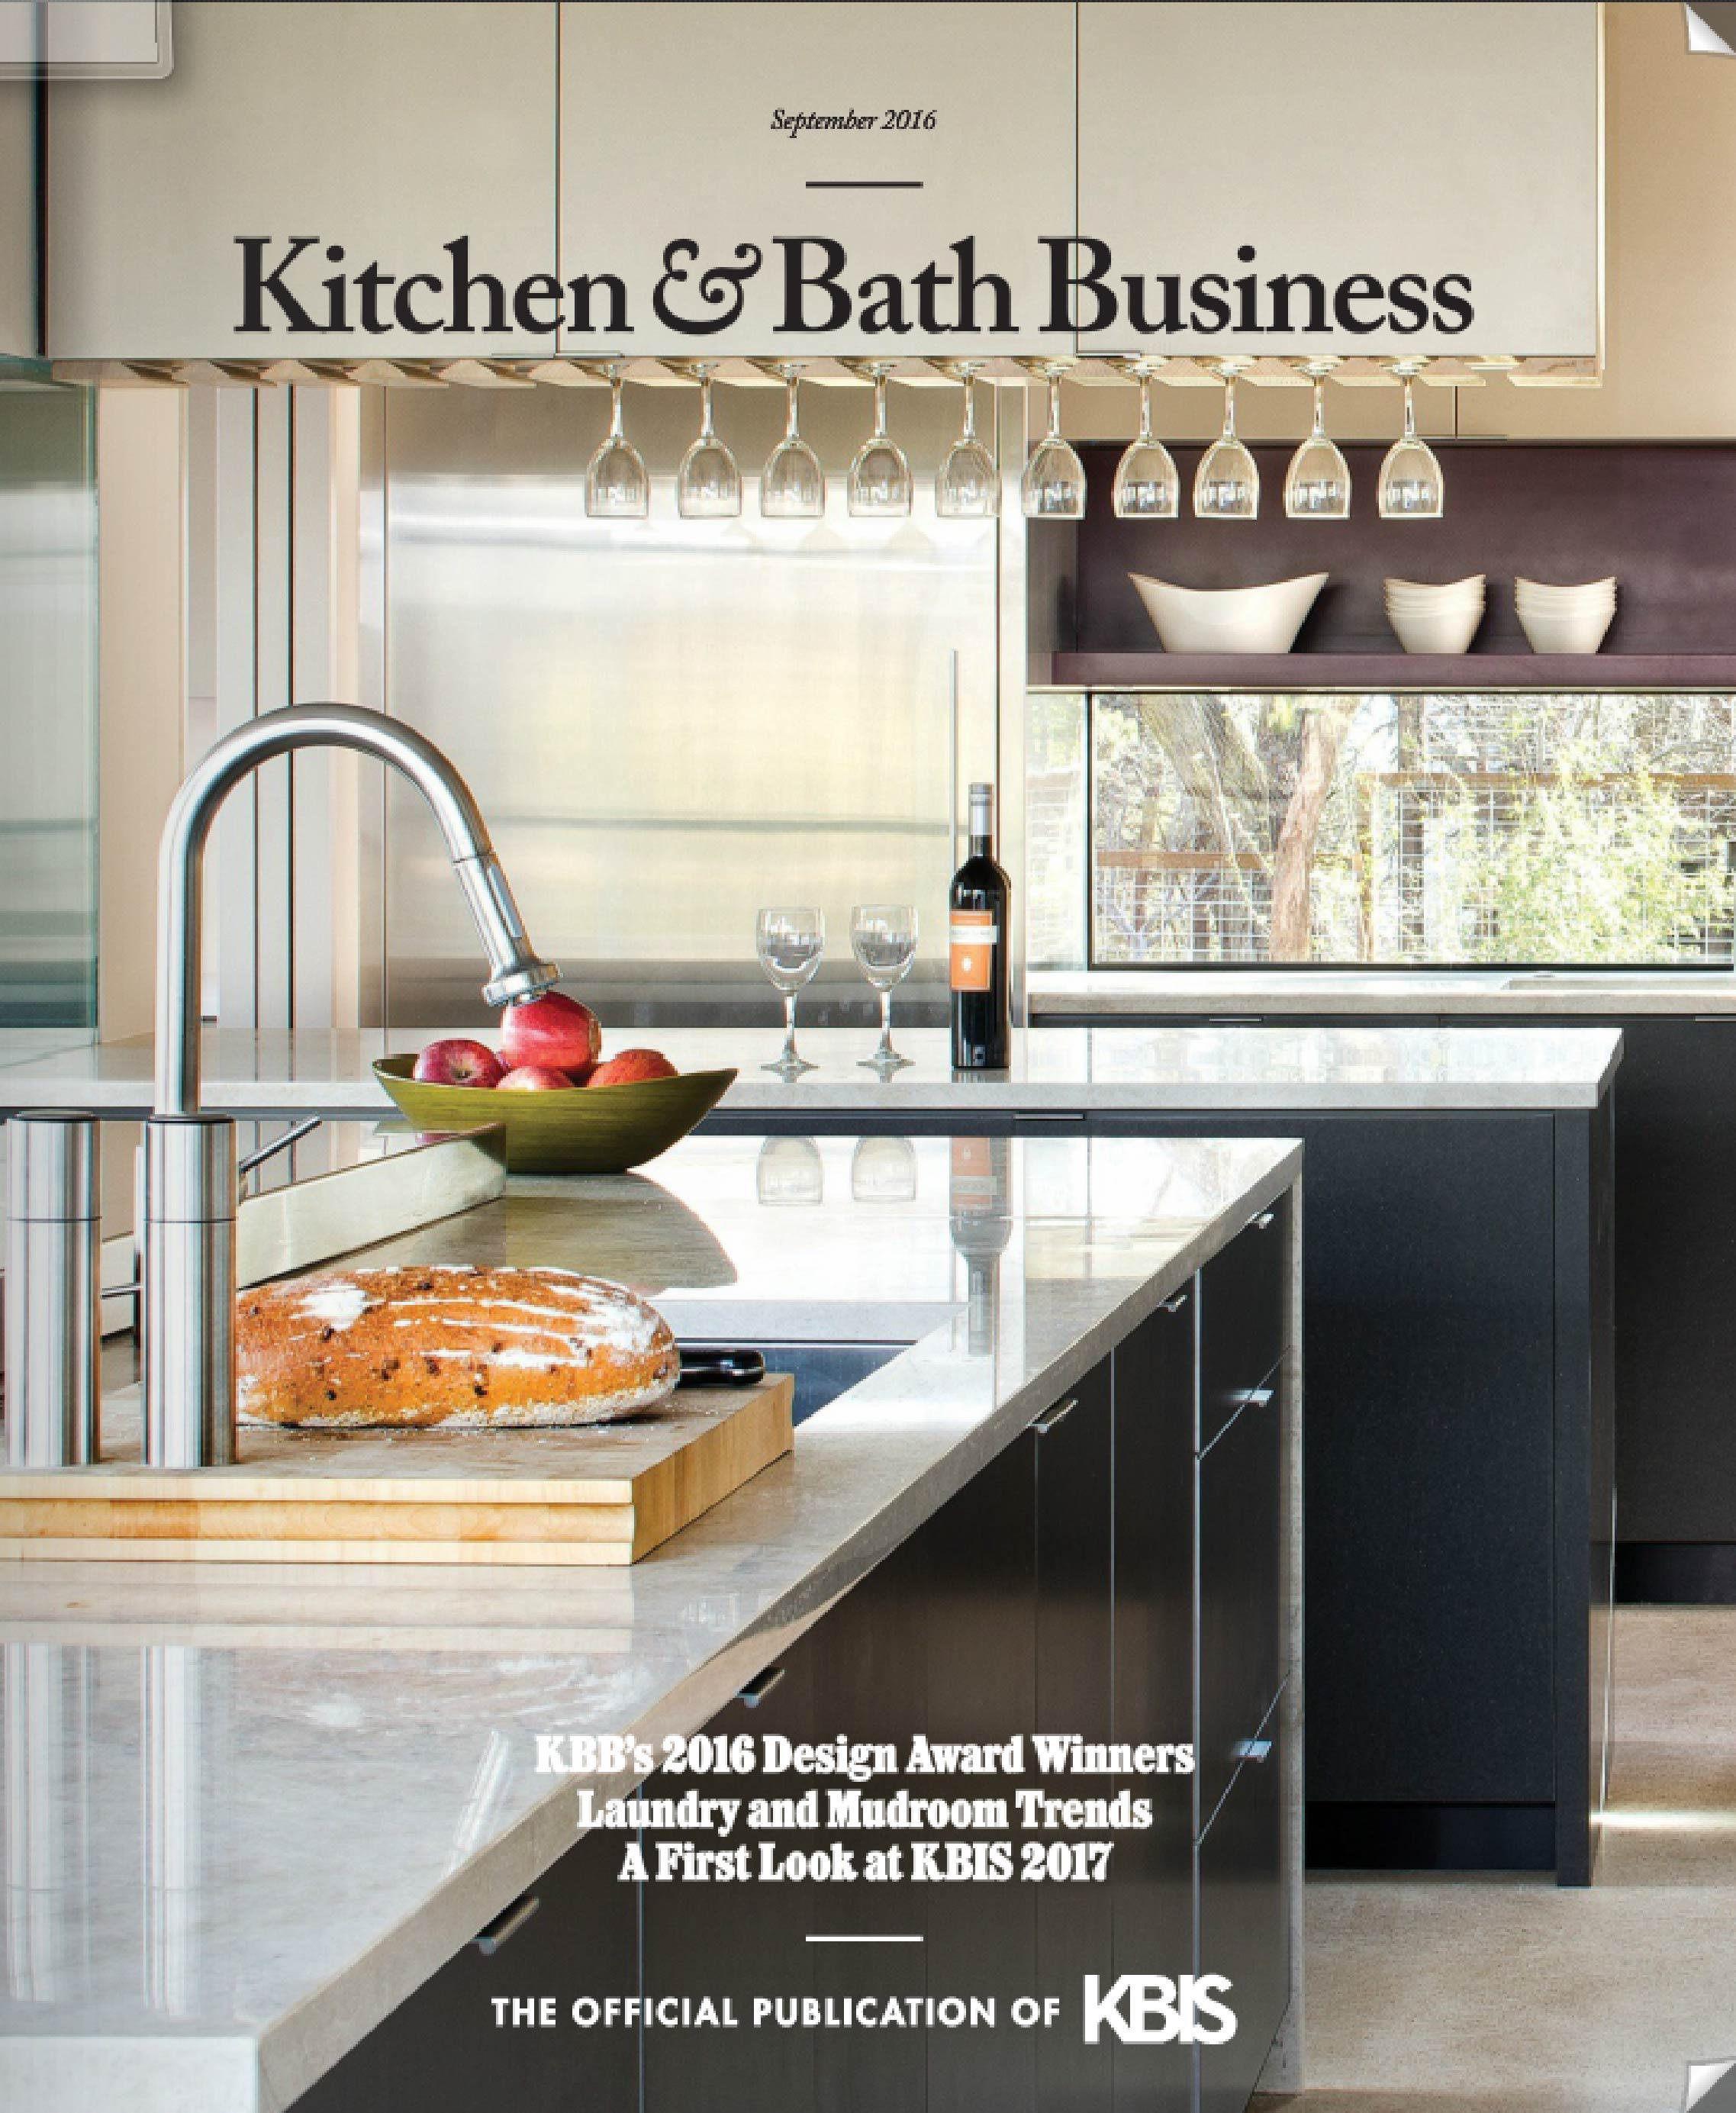 Kitchen & Bath Business Sept. 2016